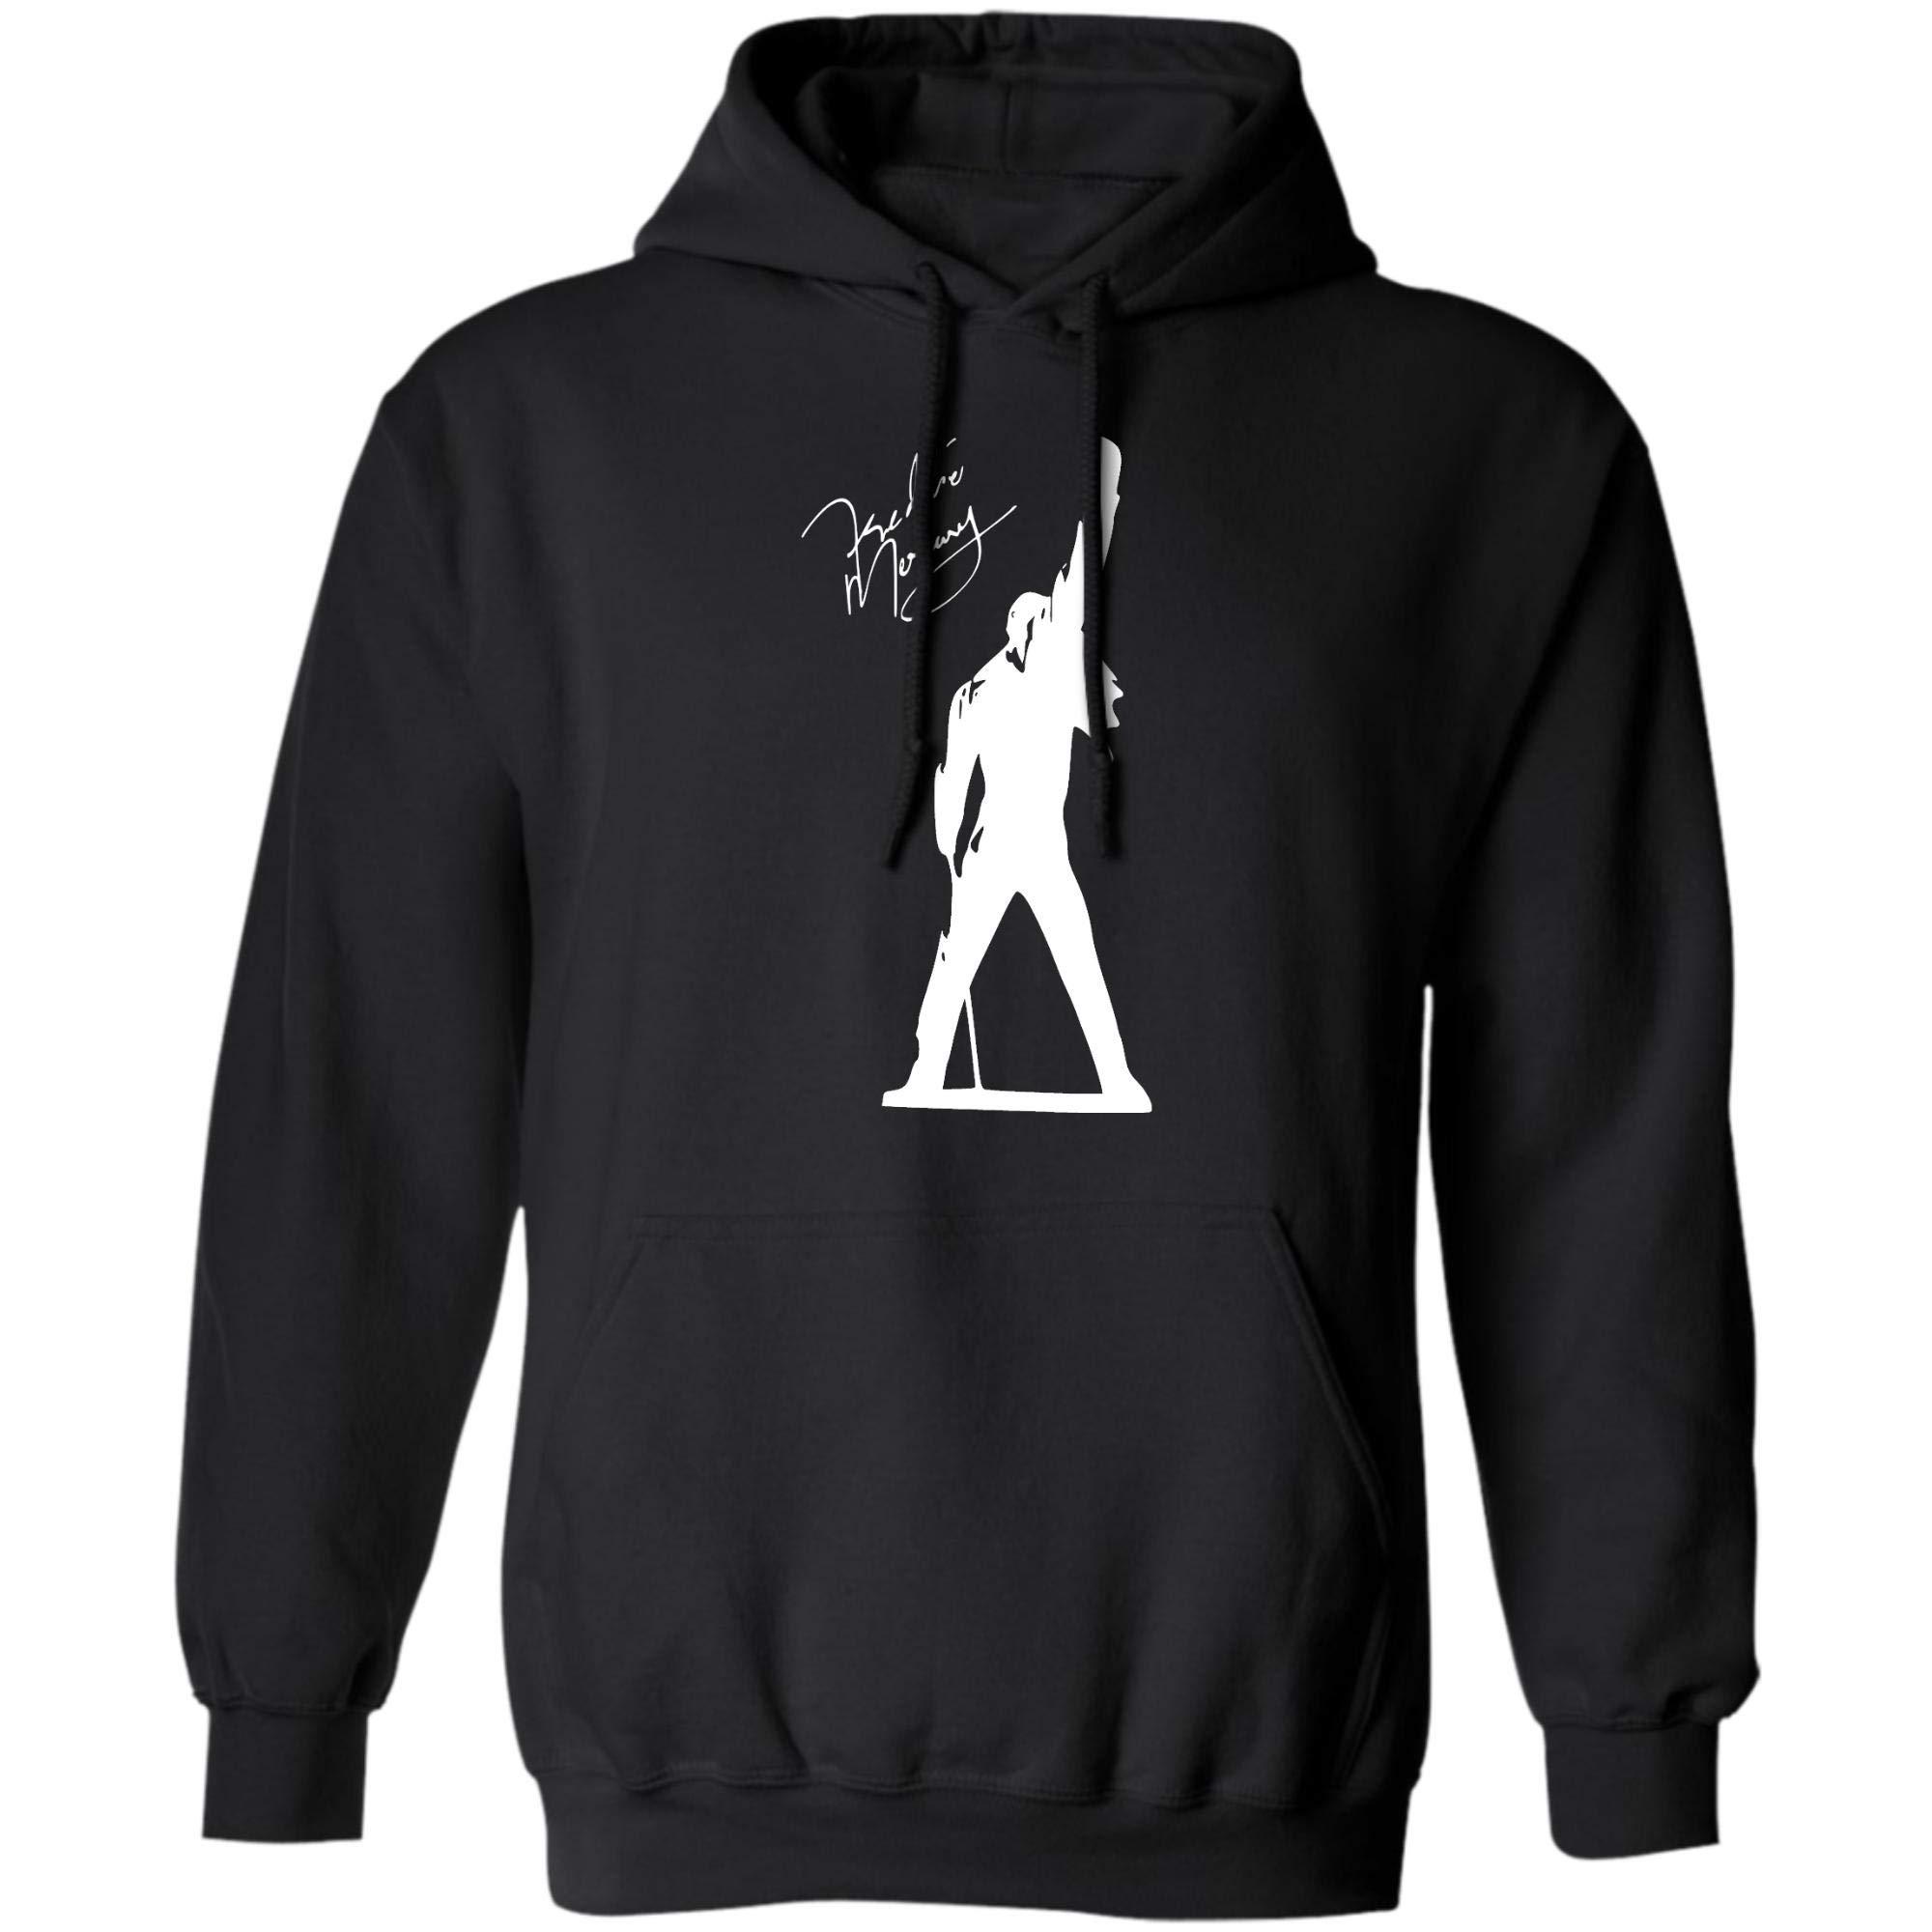 Queen Rock Band Shirt Freddie Mercury Shirt Black3